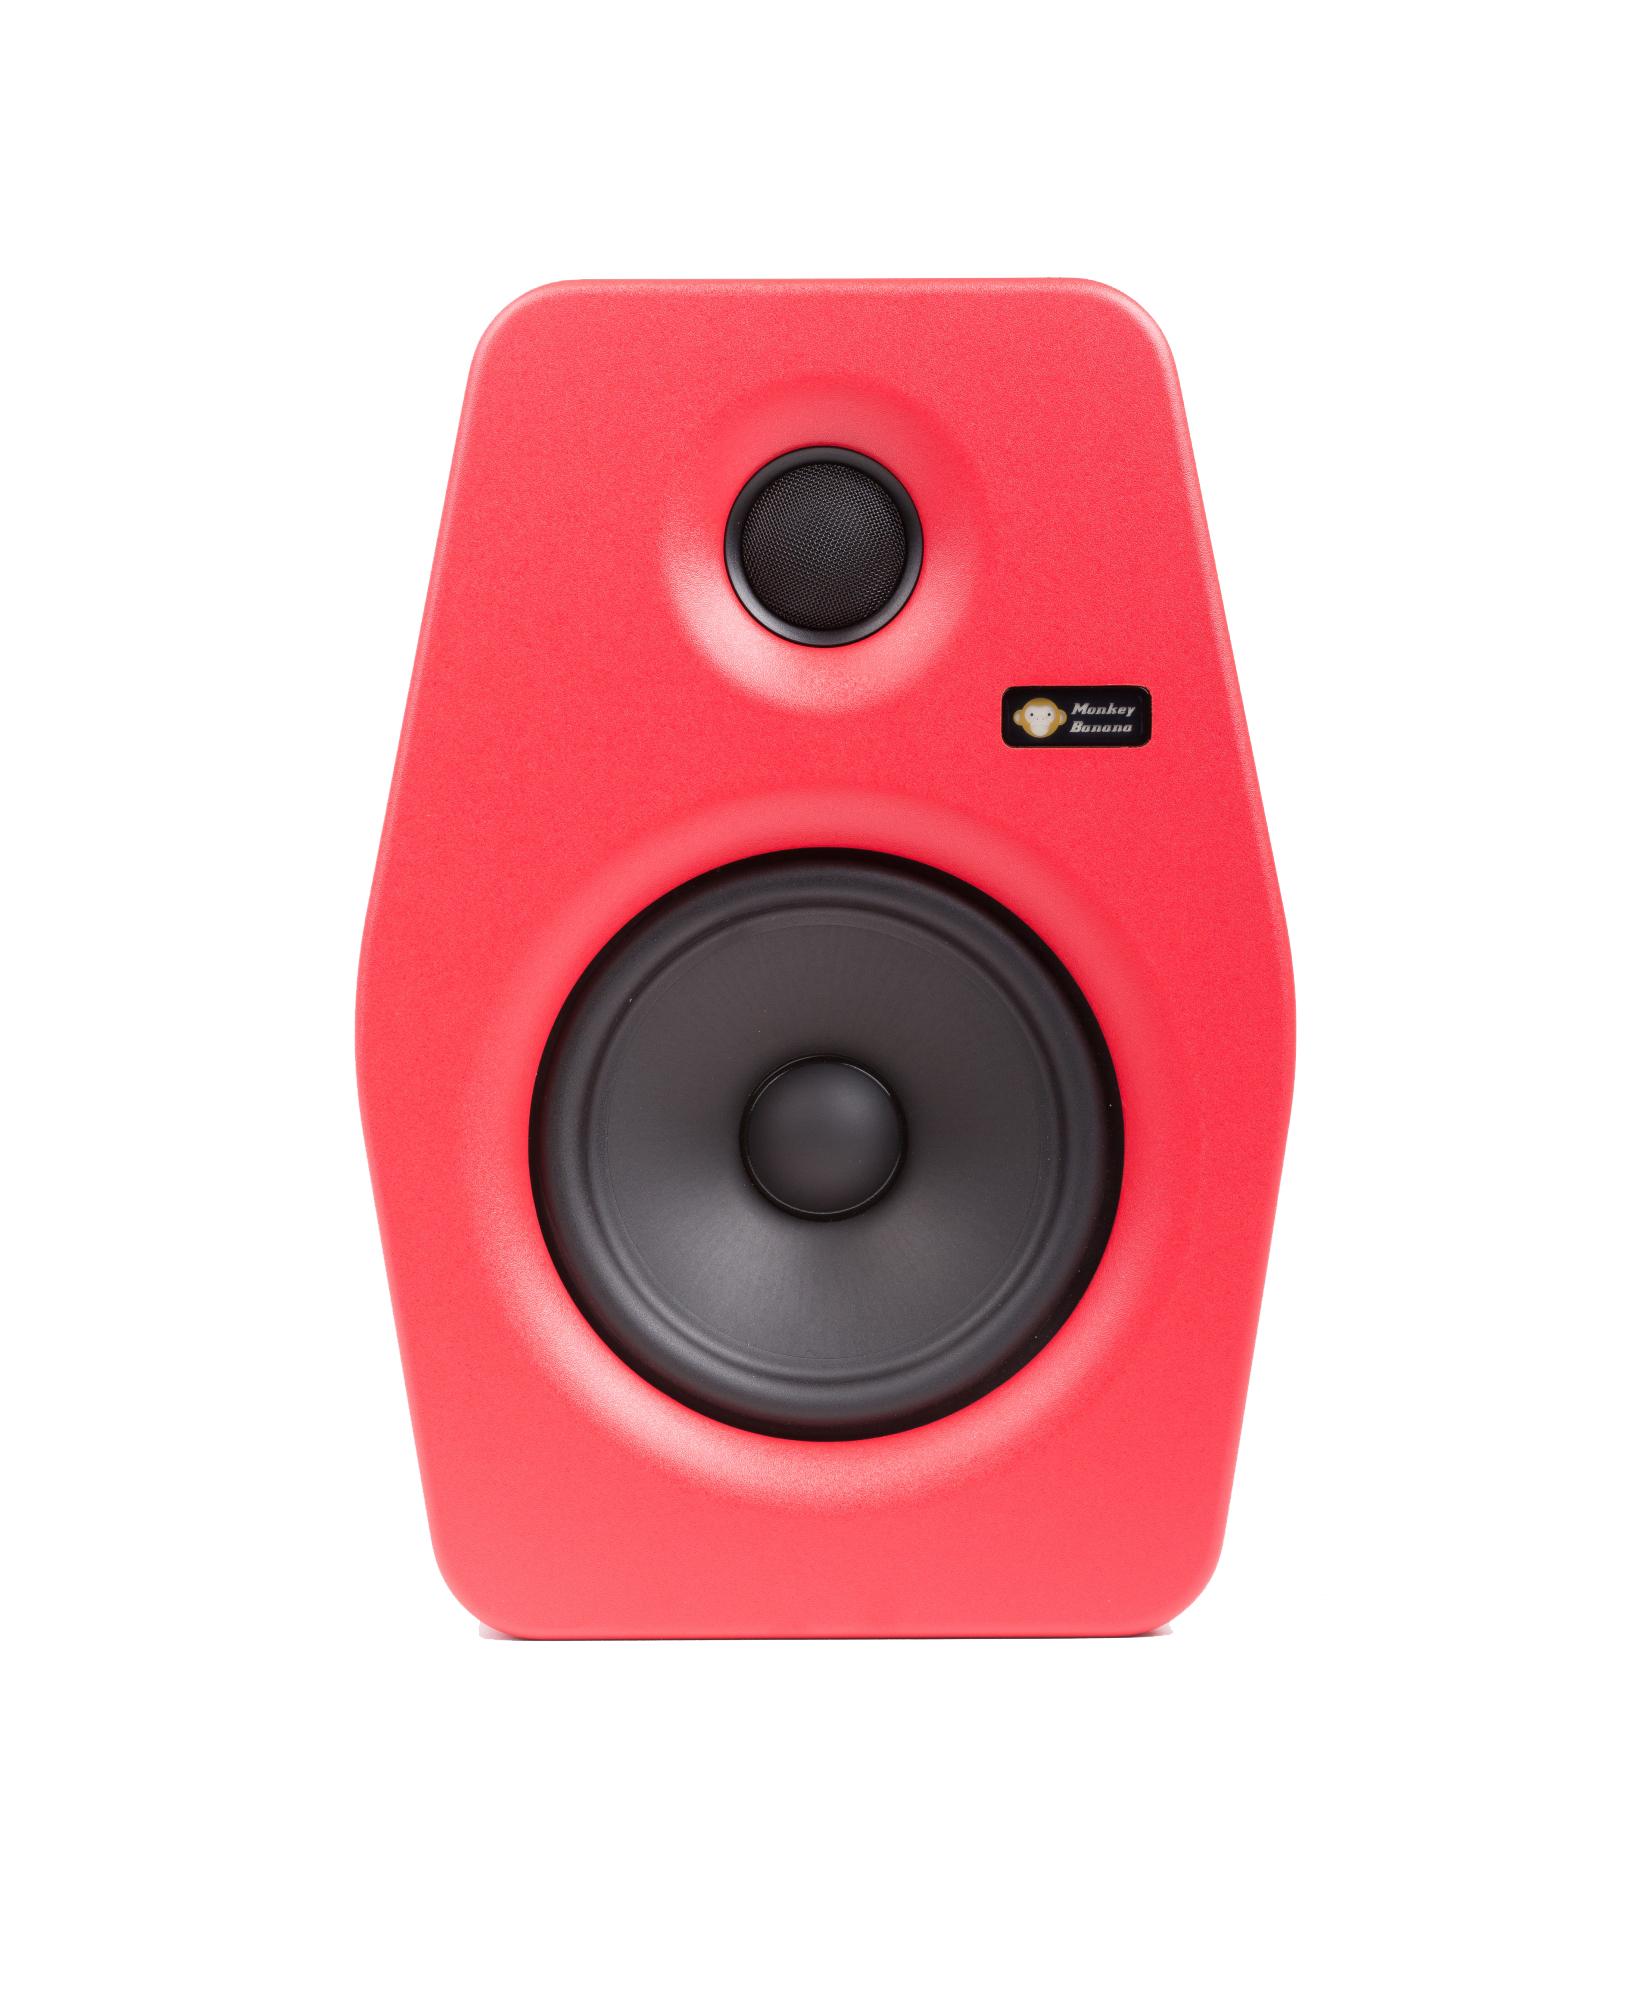 Image of   Monkey Banana Turbo 6 studie højttaler, rød